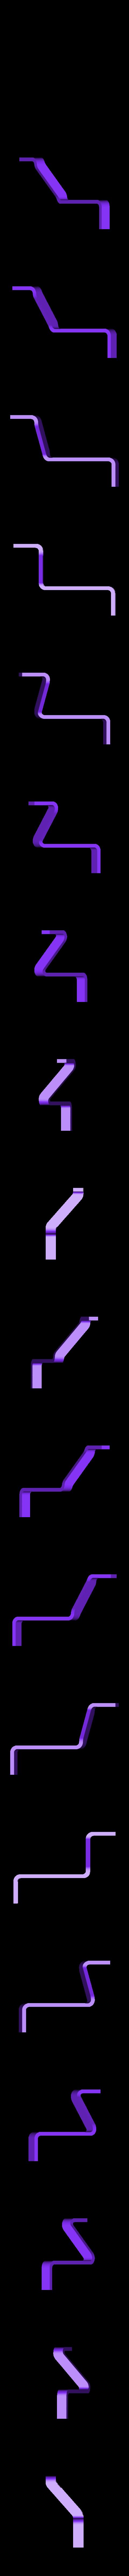 Mirrorpilot_step_2.STL Download free STL file 4-8-8-4 Big Boy Locomotive • 3D printer object, RaymondDeLuca